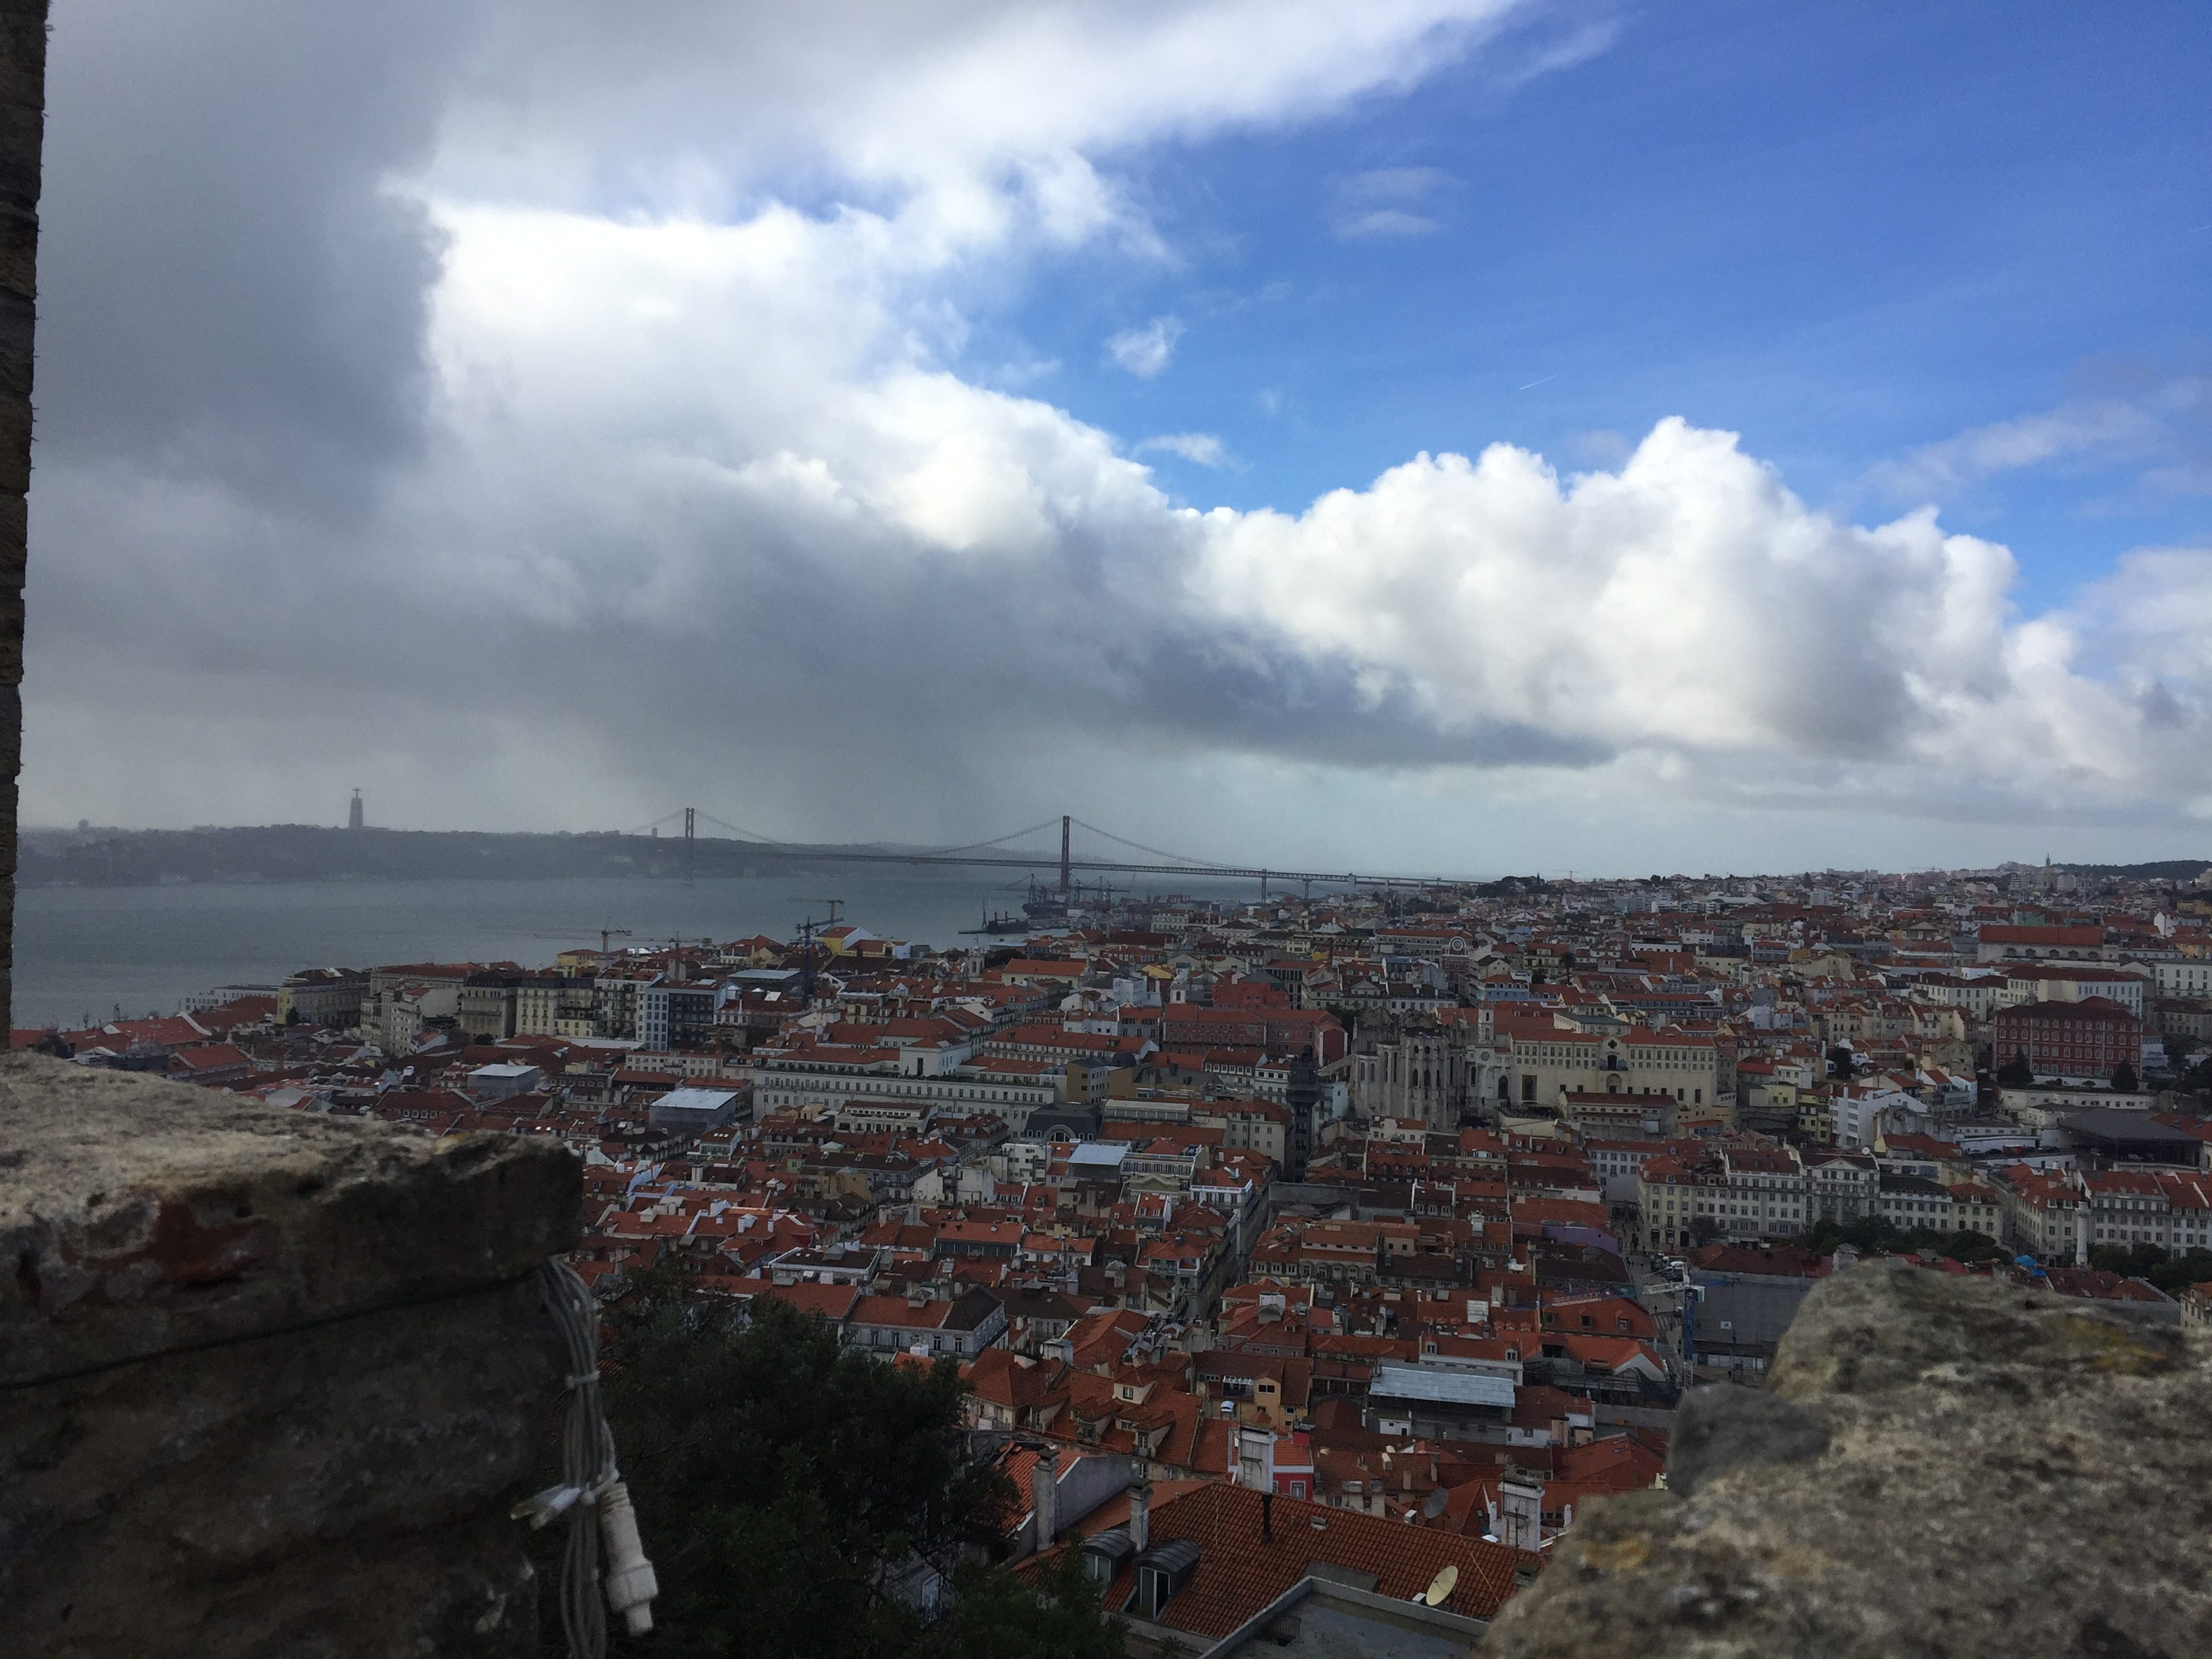 IMG 22811 e1515635702141 - Lugares para visitar en Lisboa (Parte II/II)